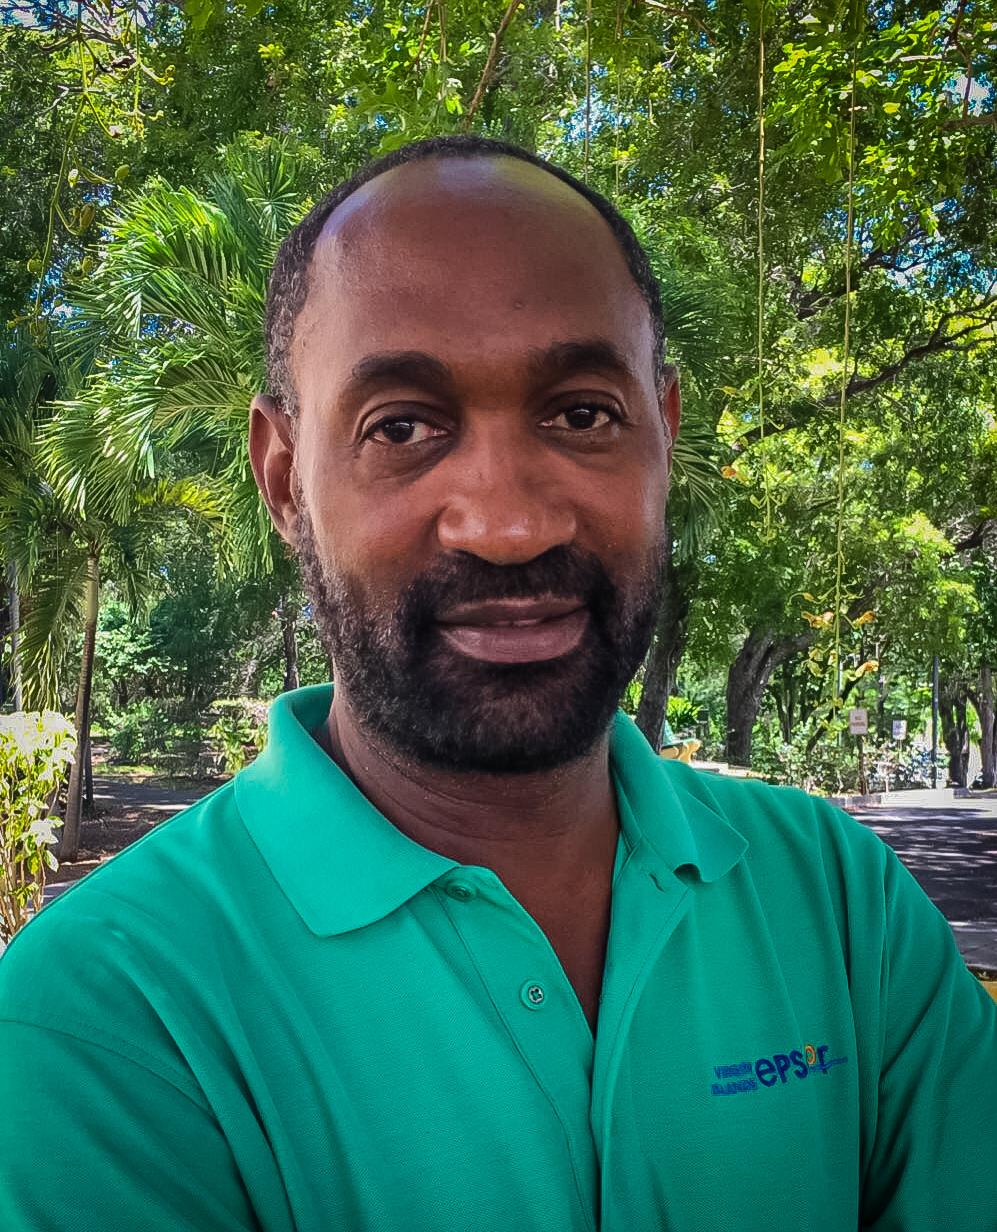 Nicolas C. Drayton   Assistant Director, St. Croix District   ndrayton@uvi.edu